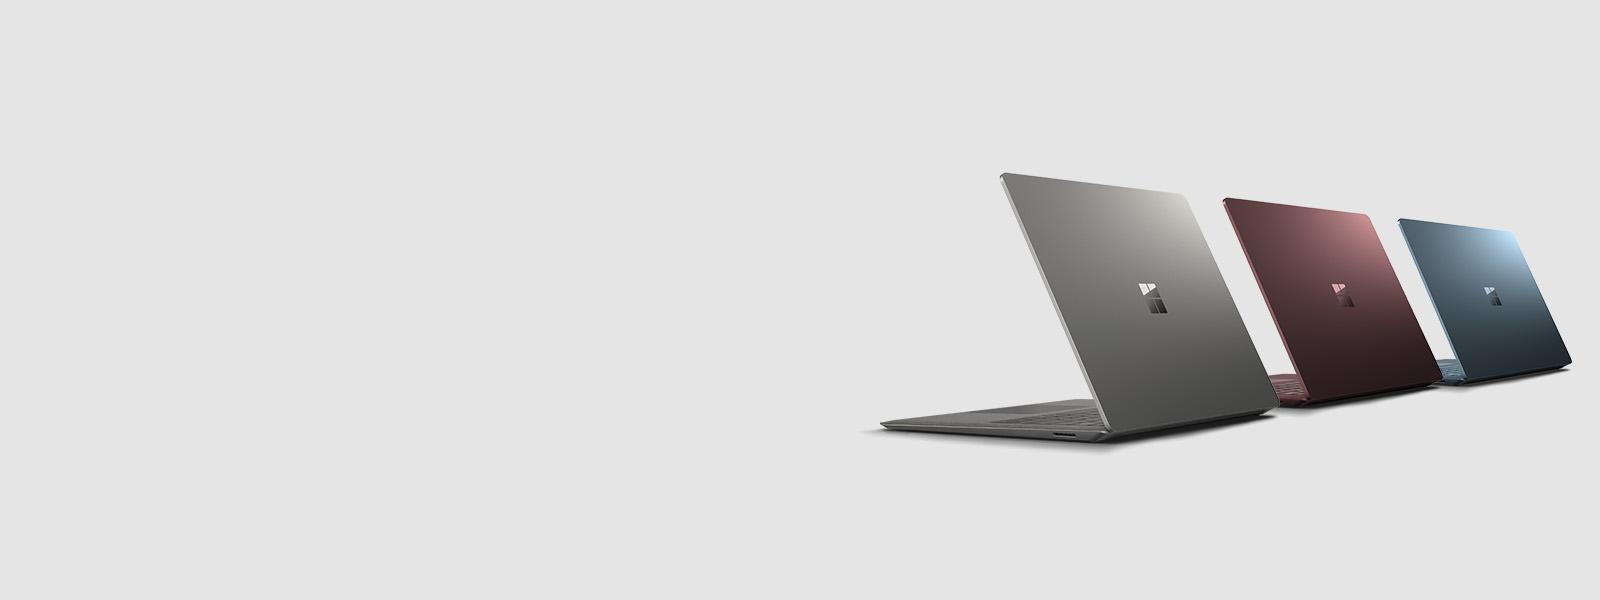 Surface Laptop in den Farben Bordeaux Rot, Kobalt Blau oder Graphit Gold